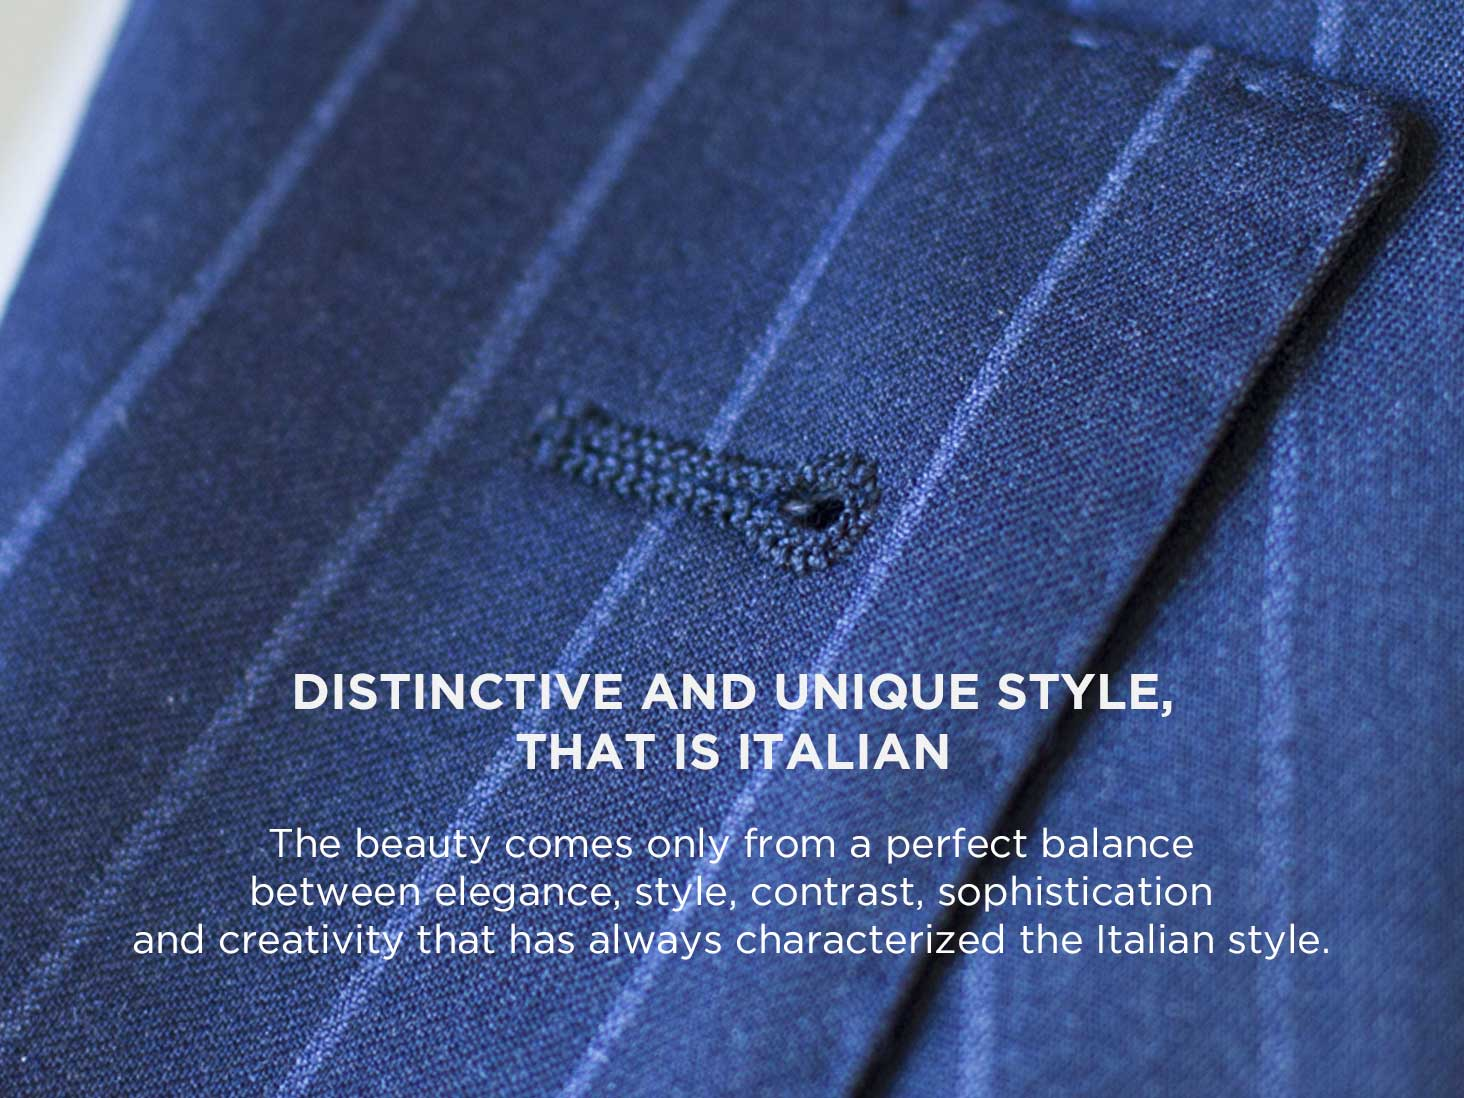 Men's Fine Italian Suits, Custom Suits Online - Made in